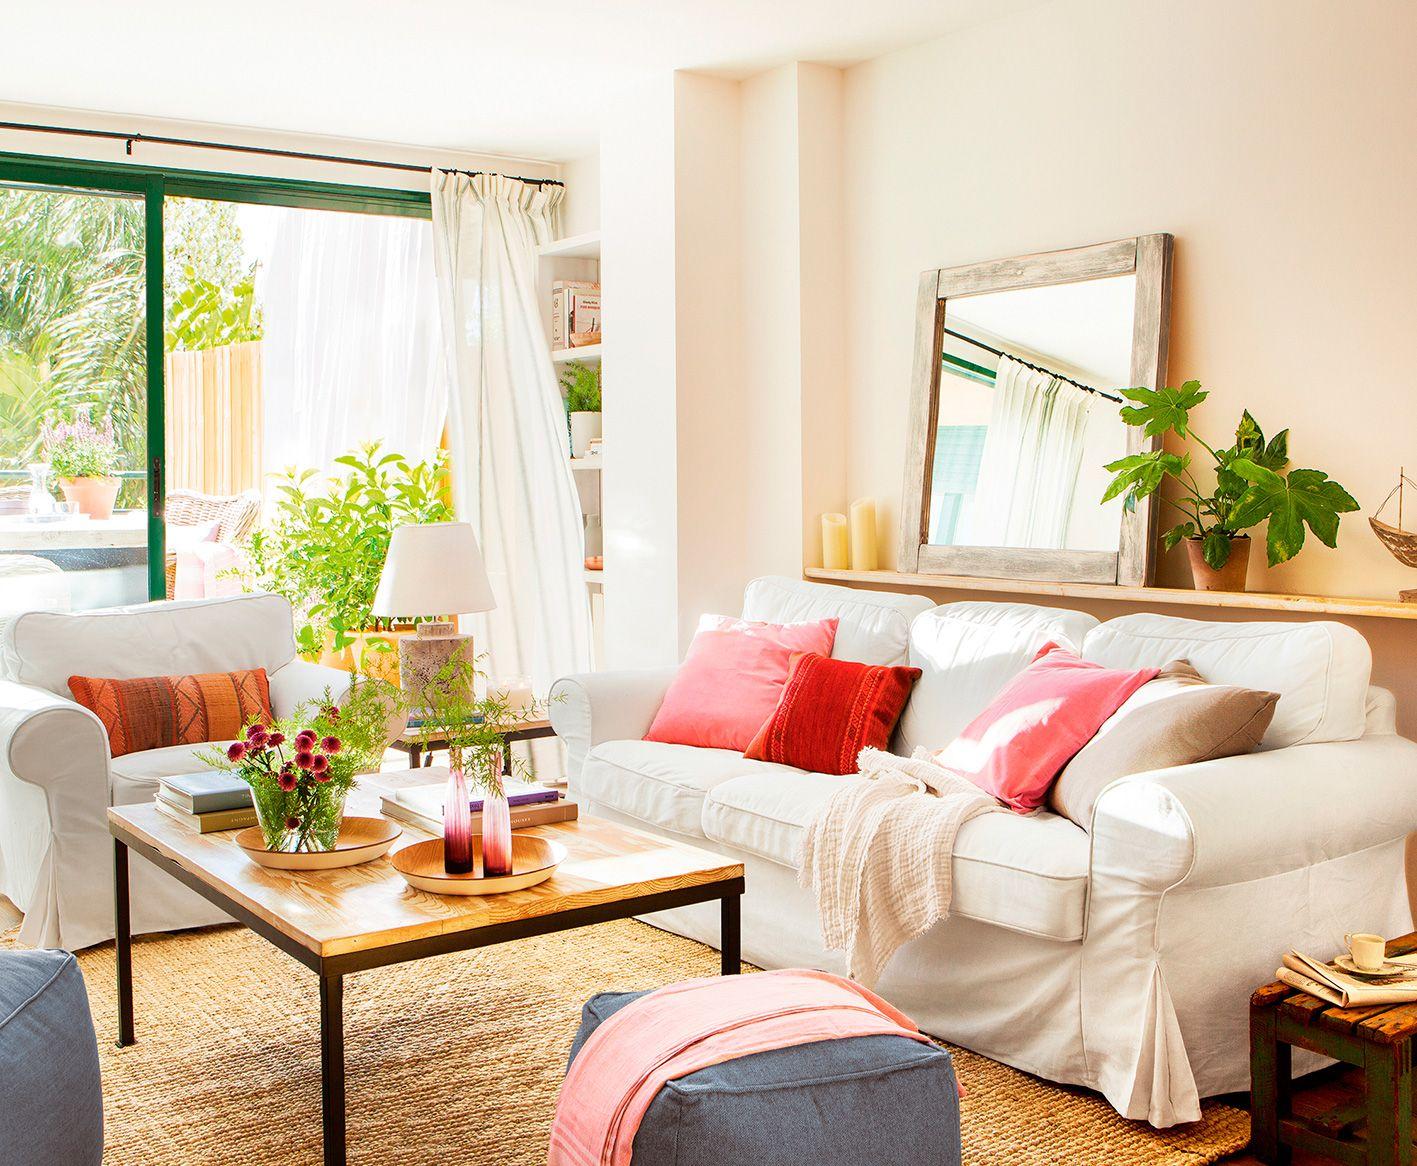 Sal n con con salida a la terraza con sof blanco - Comedor para terraza ...